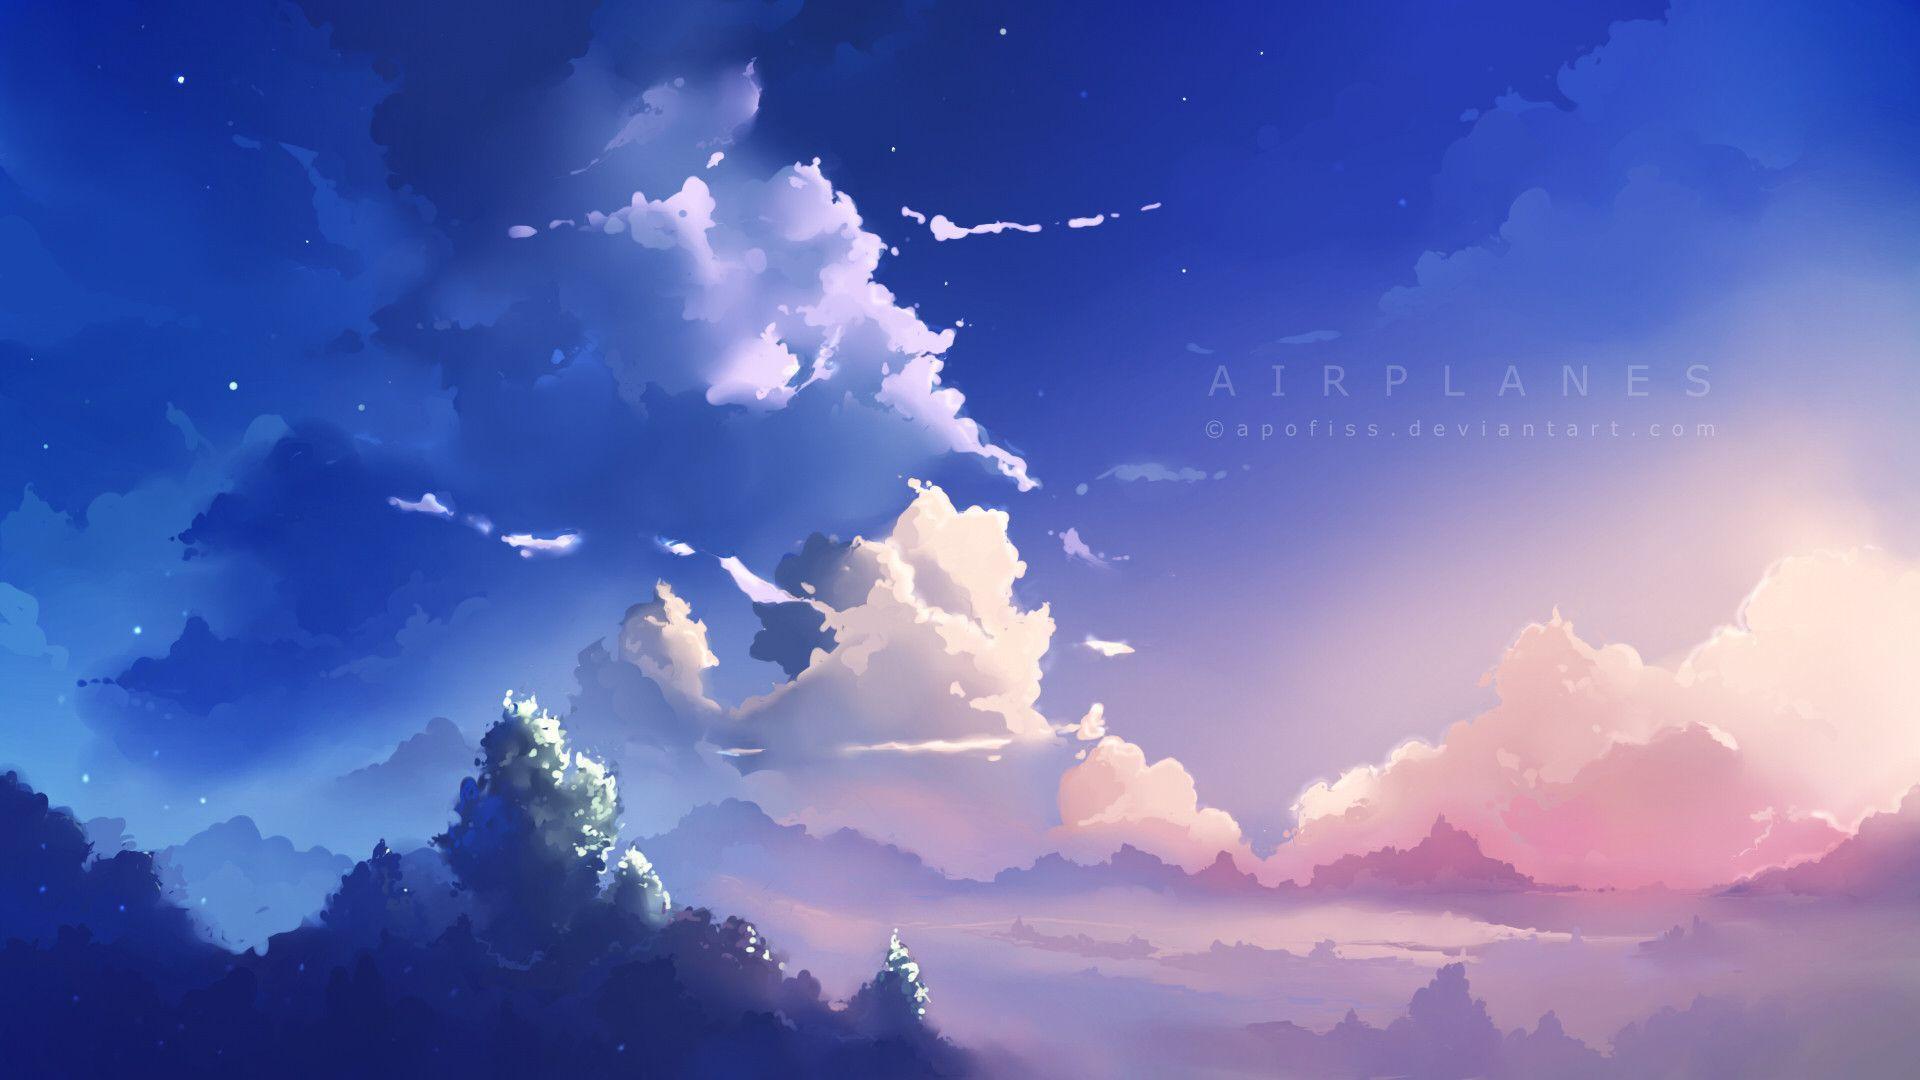 Desktop Anime Wallpapers - Top Free